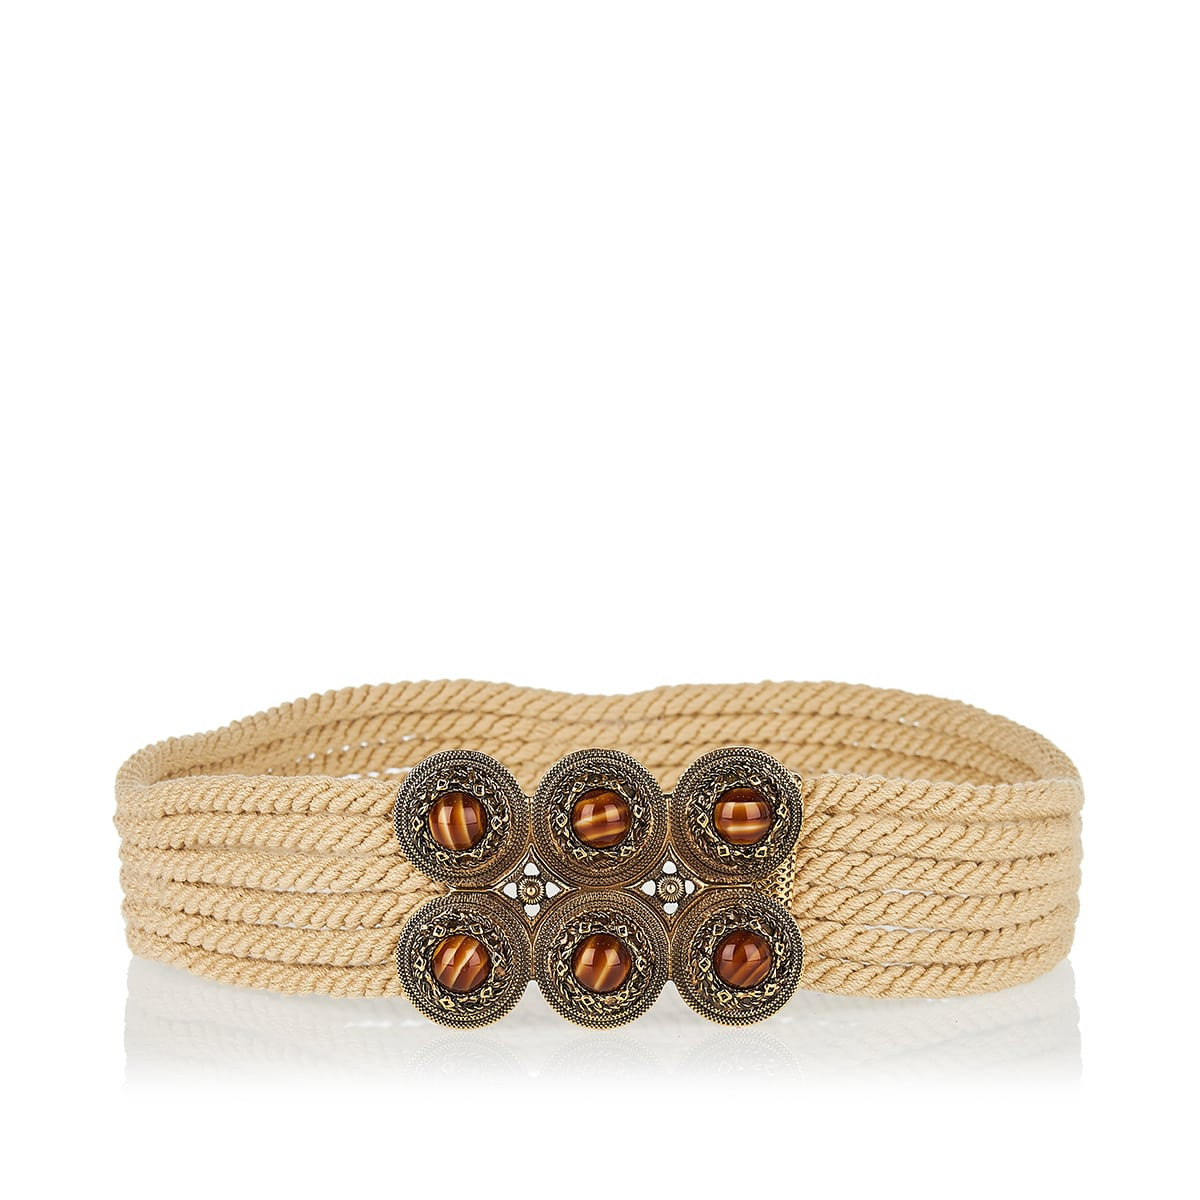 Jeweled-buckle cord belt